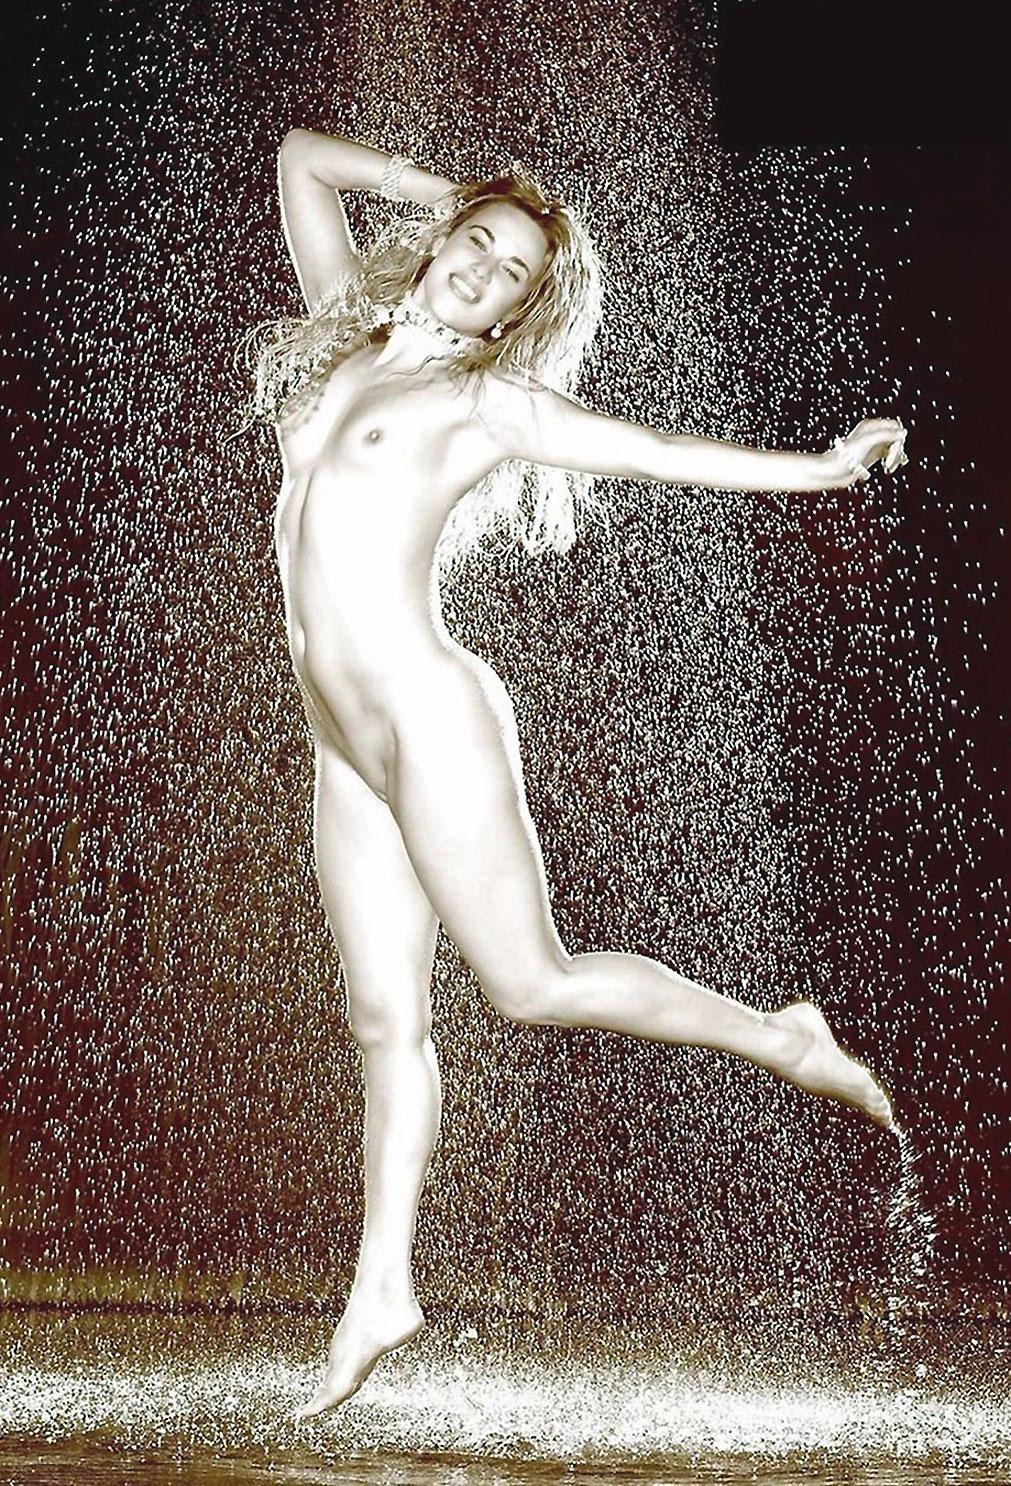 Nudes wwe lana C.J. Perry